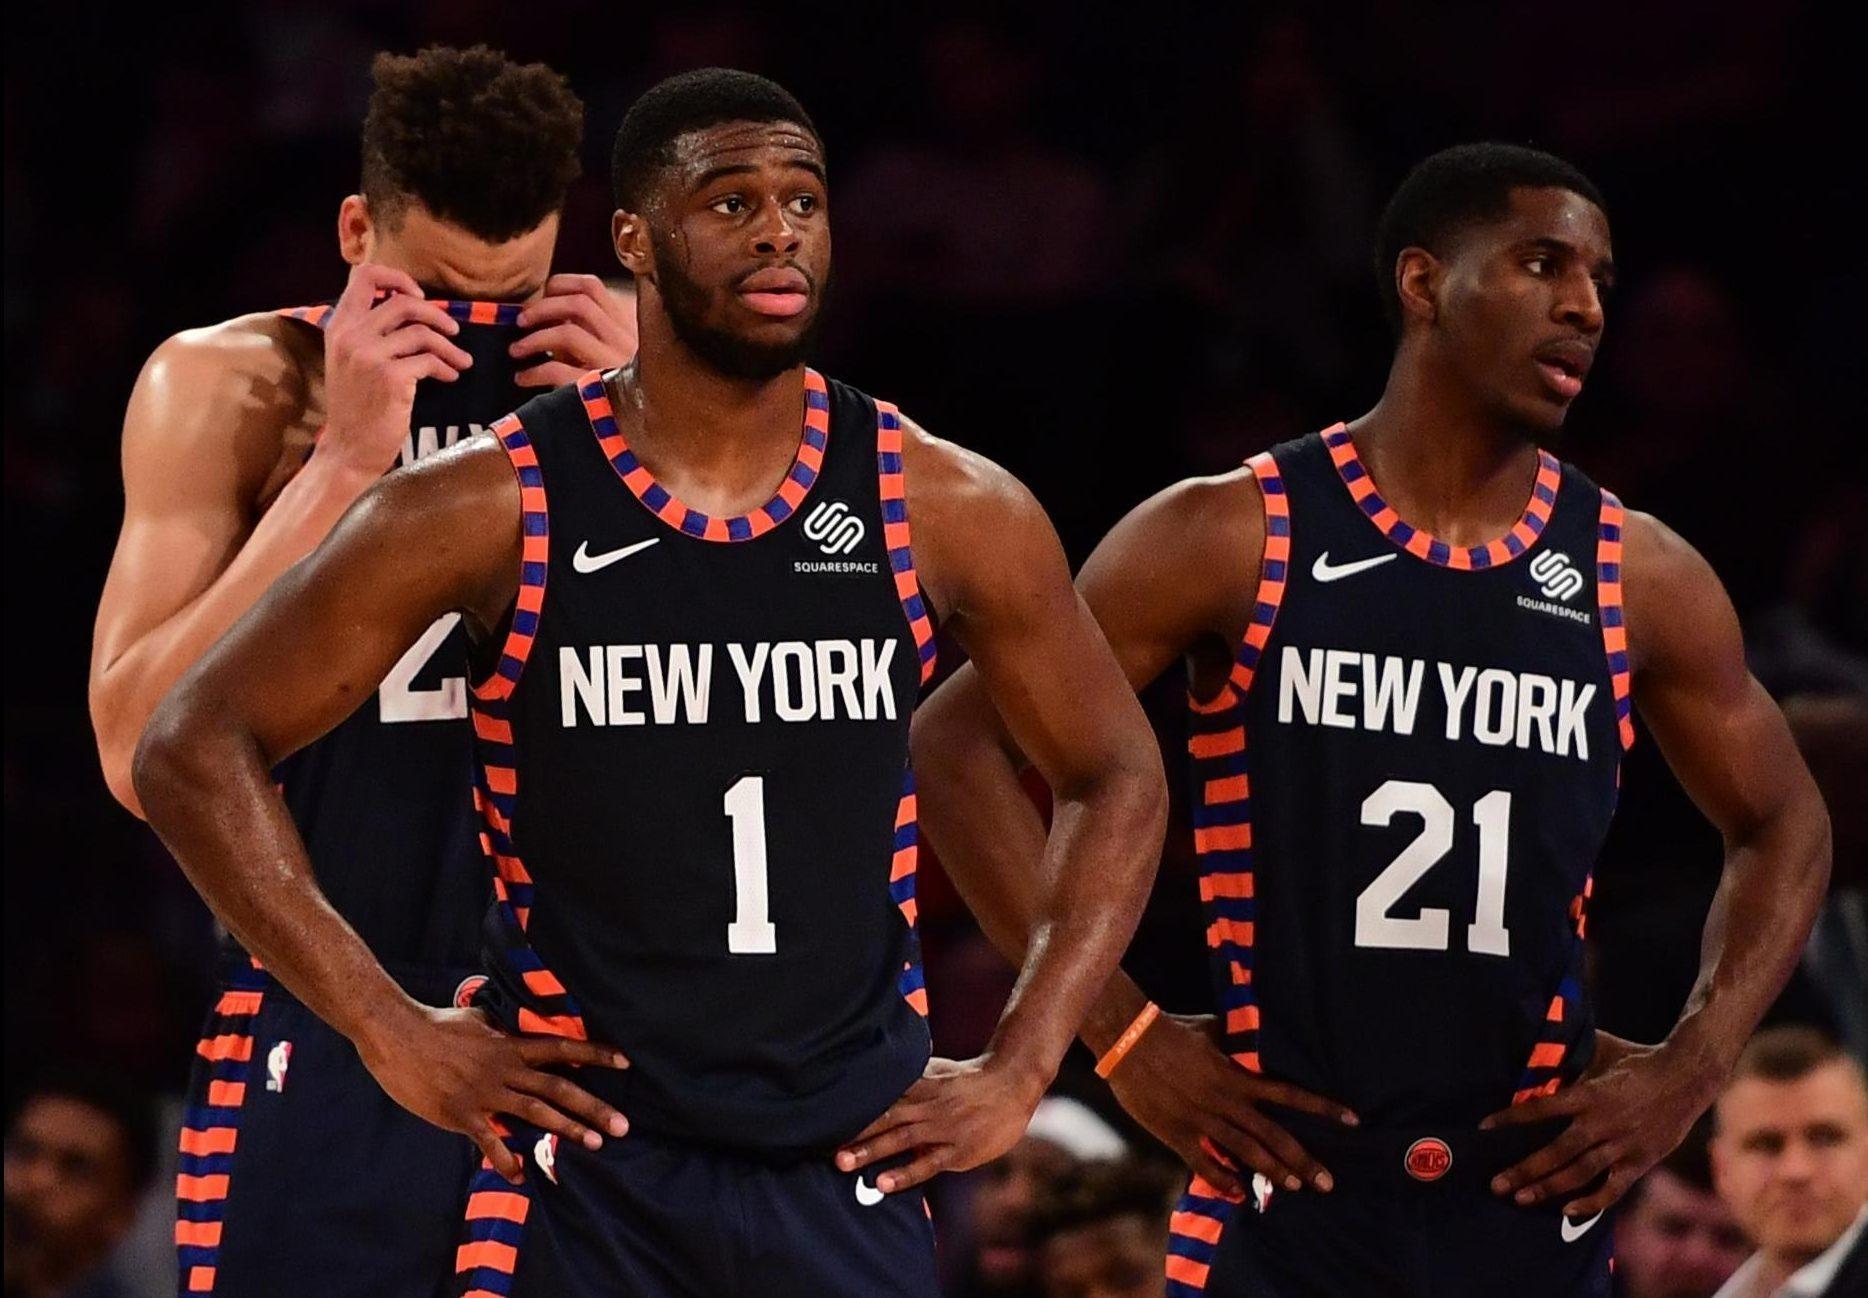 Grant Hill thinks NBA superstars still want to play for New York despite Knicks' barren run